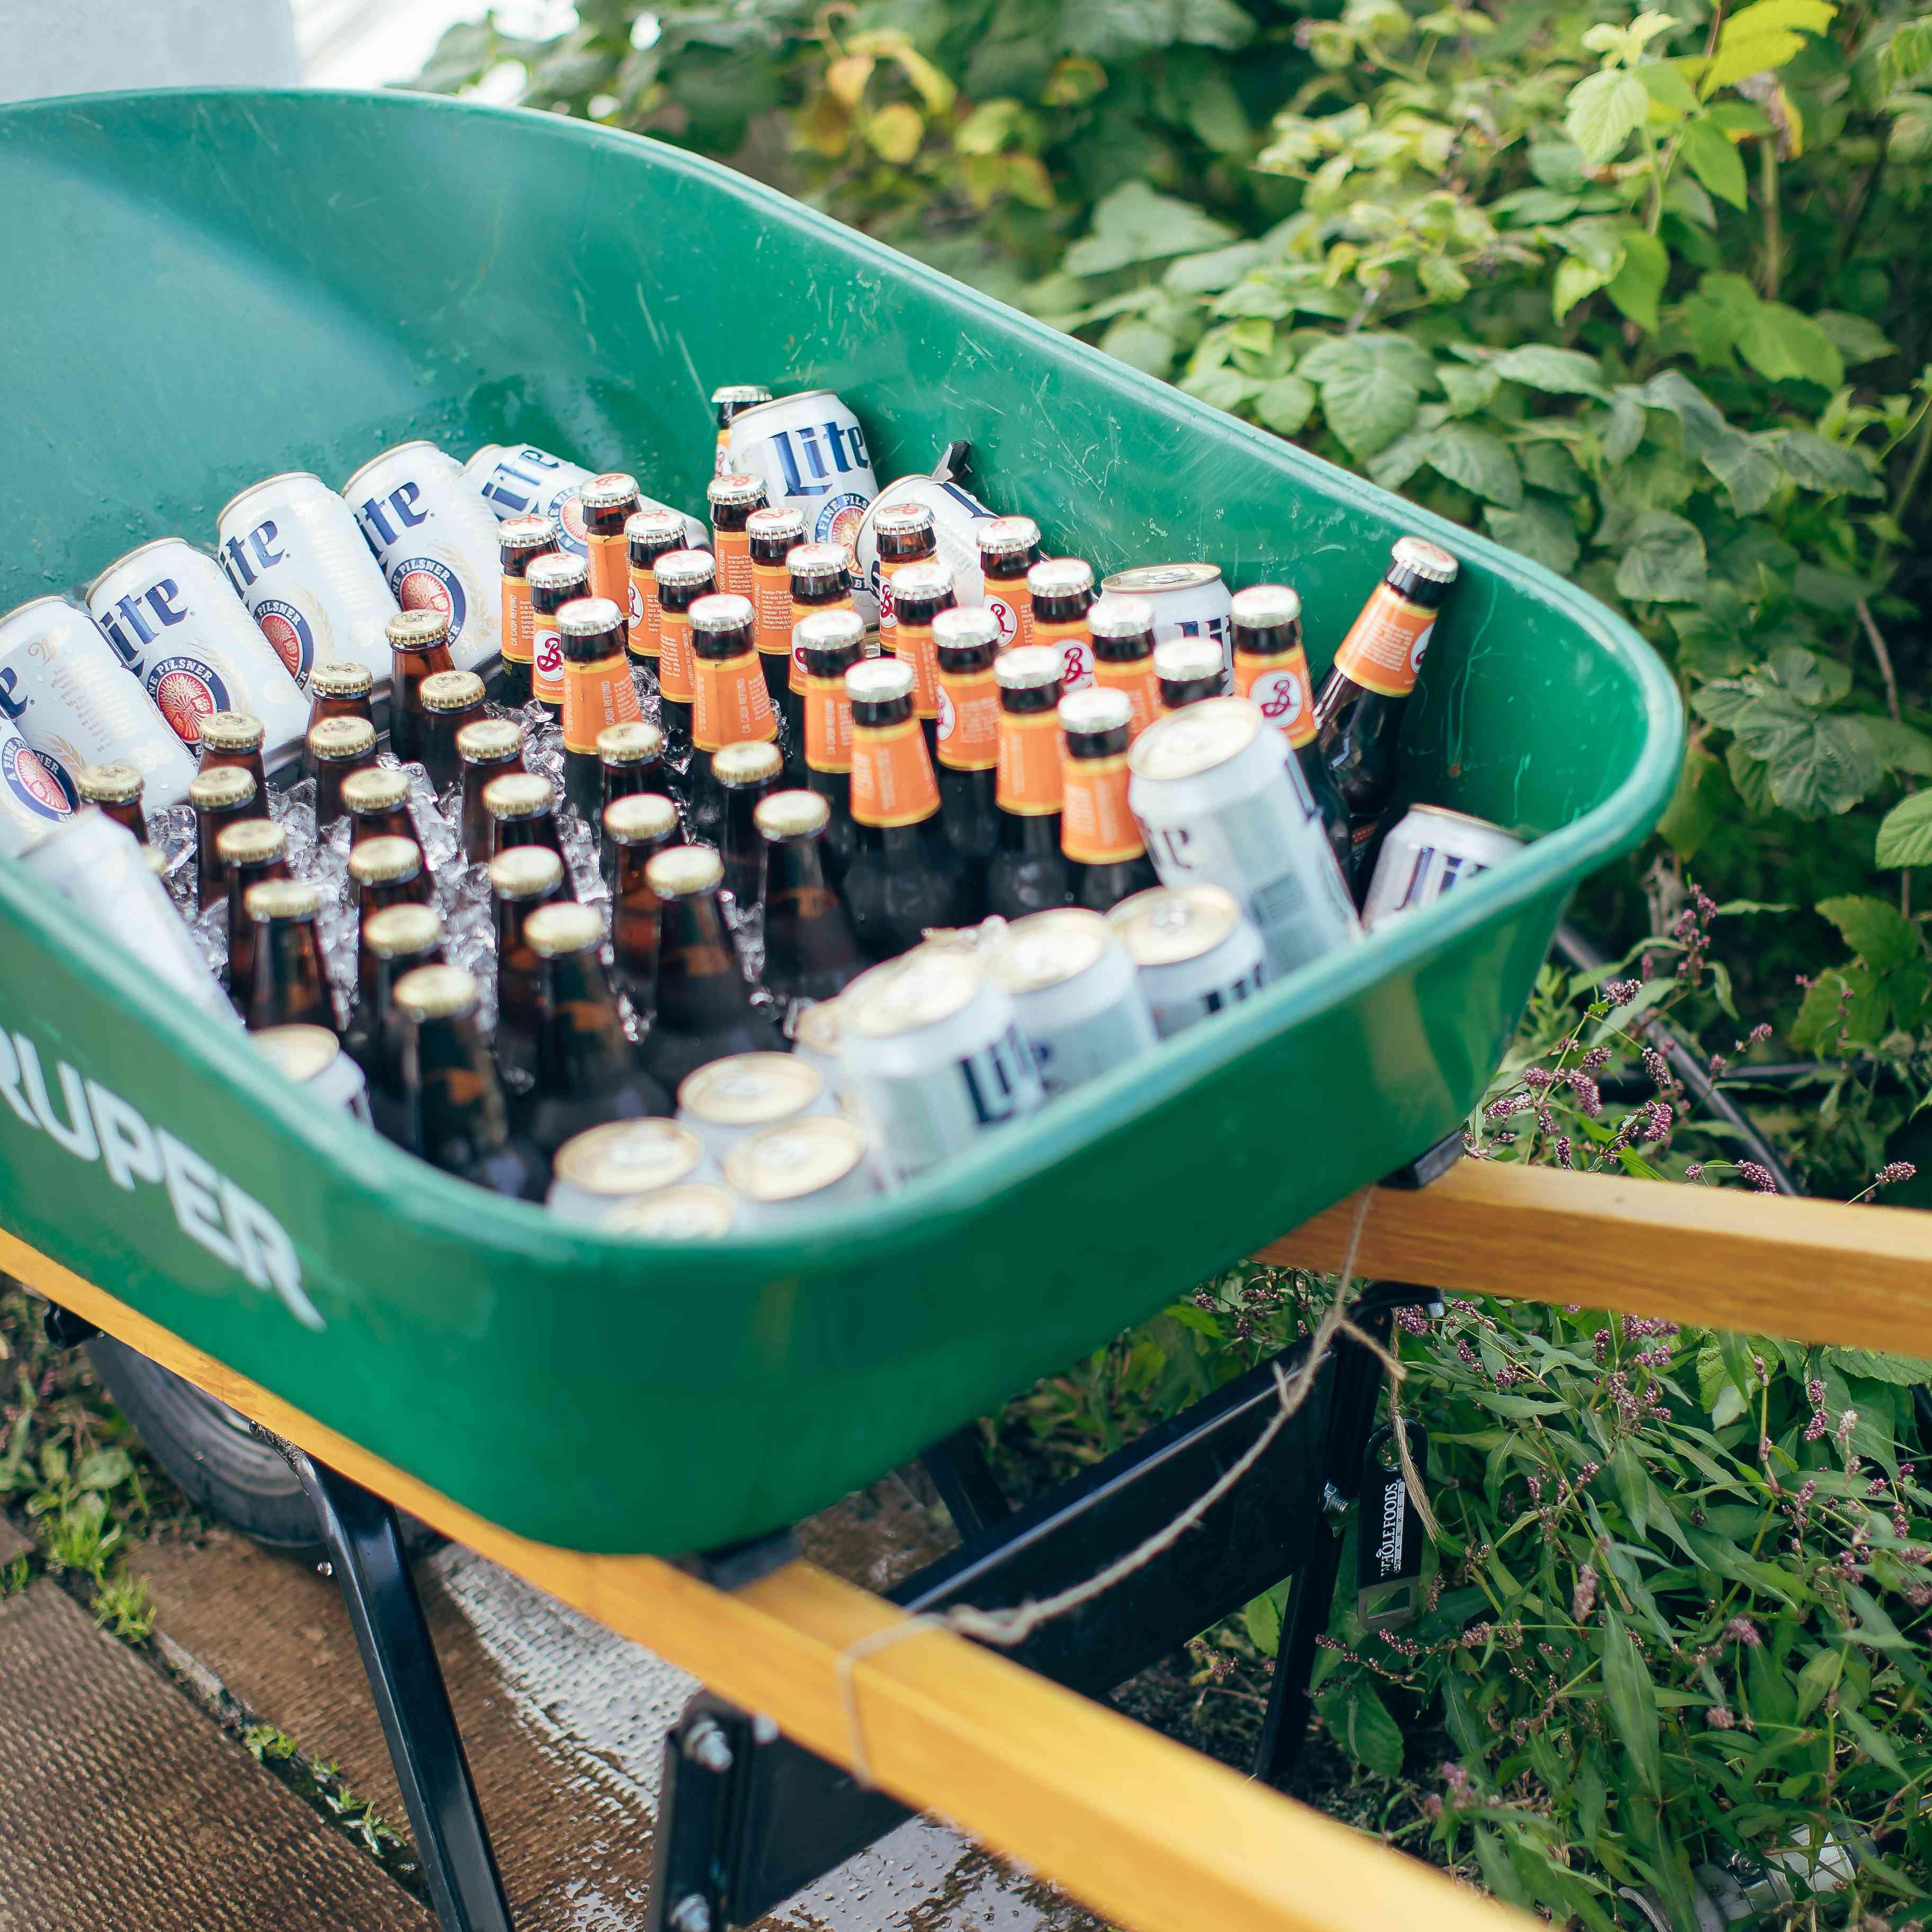 Beer in wheel barrow